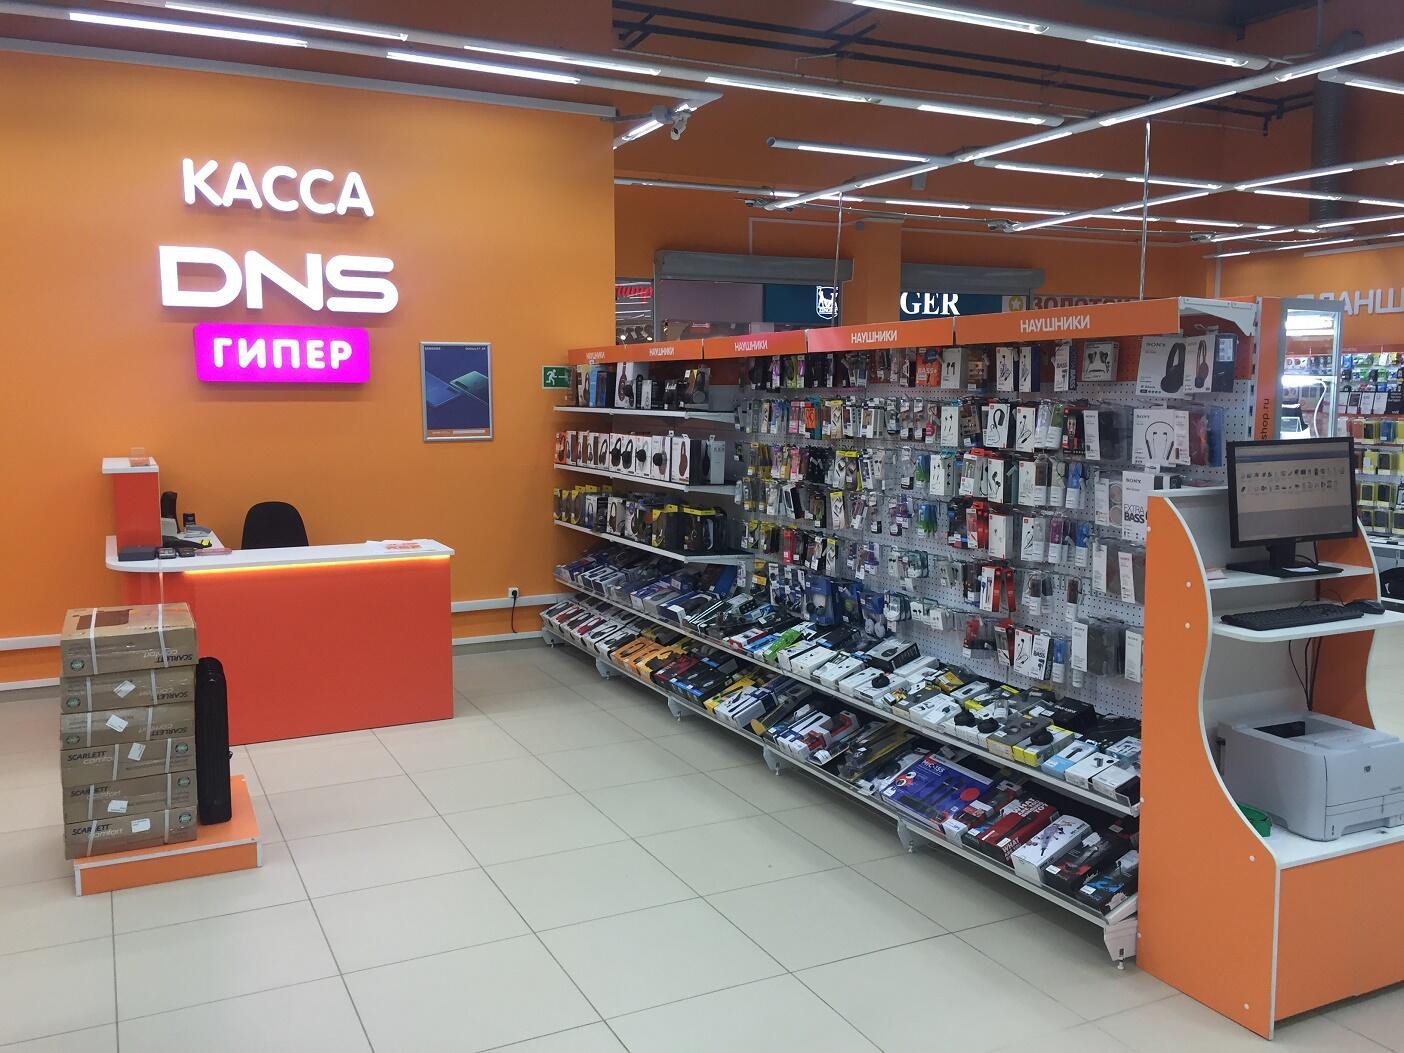 18f0e794bec74 Ухта – магазин DNS ДНС Гипер в ТРЦ «Ярмарка» (правое крыло) : адрес ...